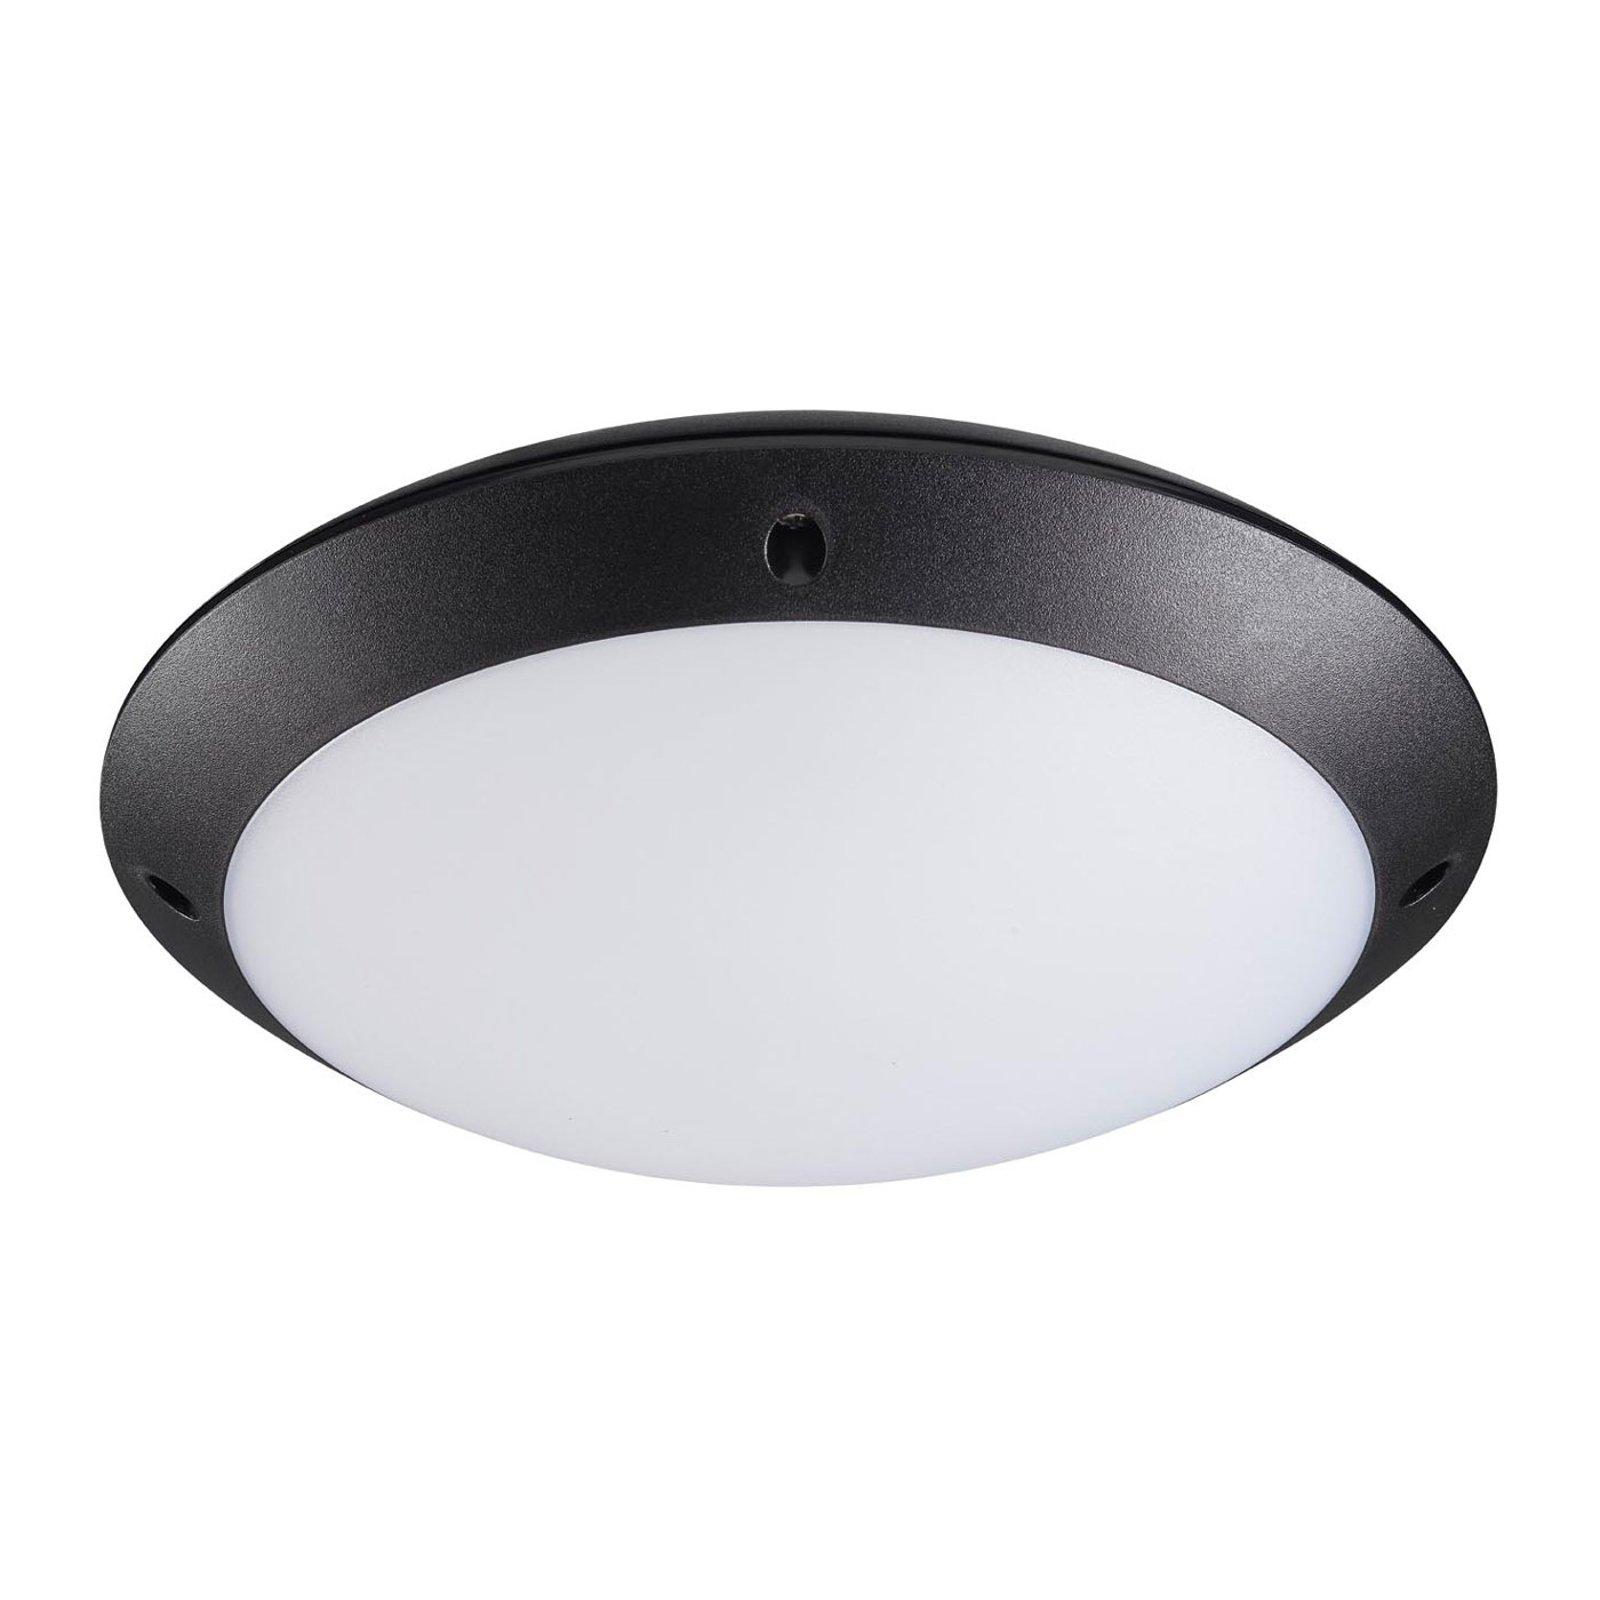 Sylvania Start taklampe SensorDim 4 000 K svart